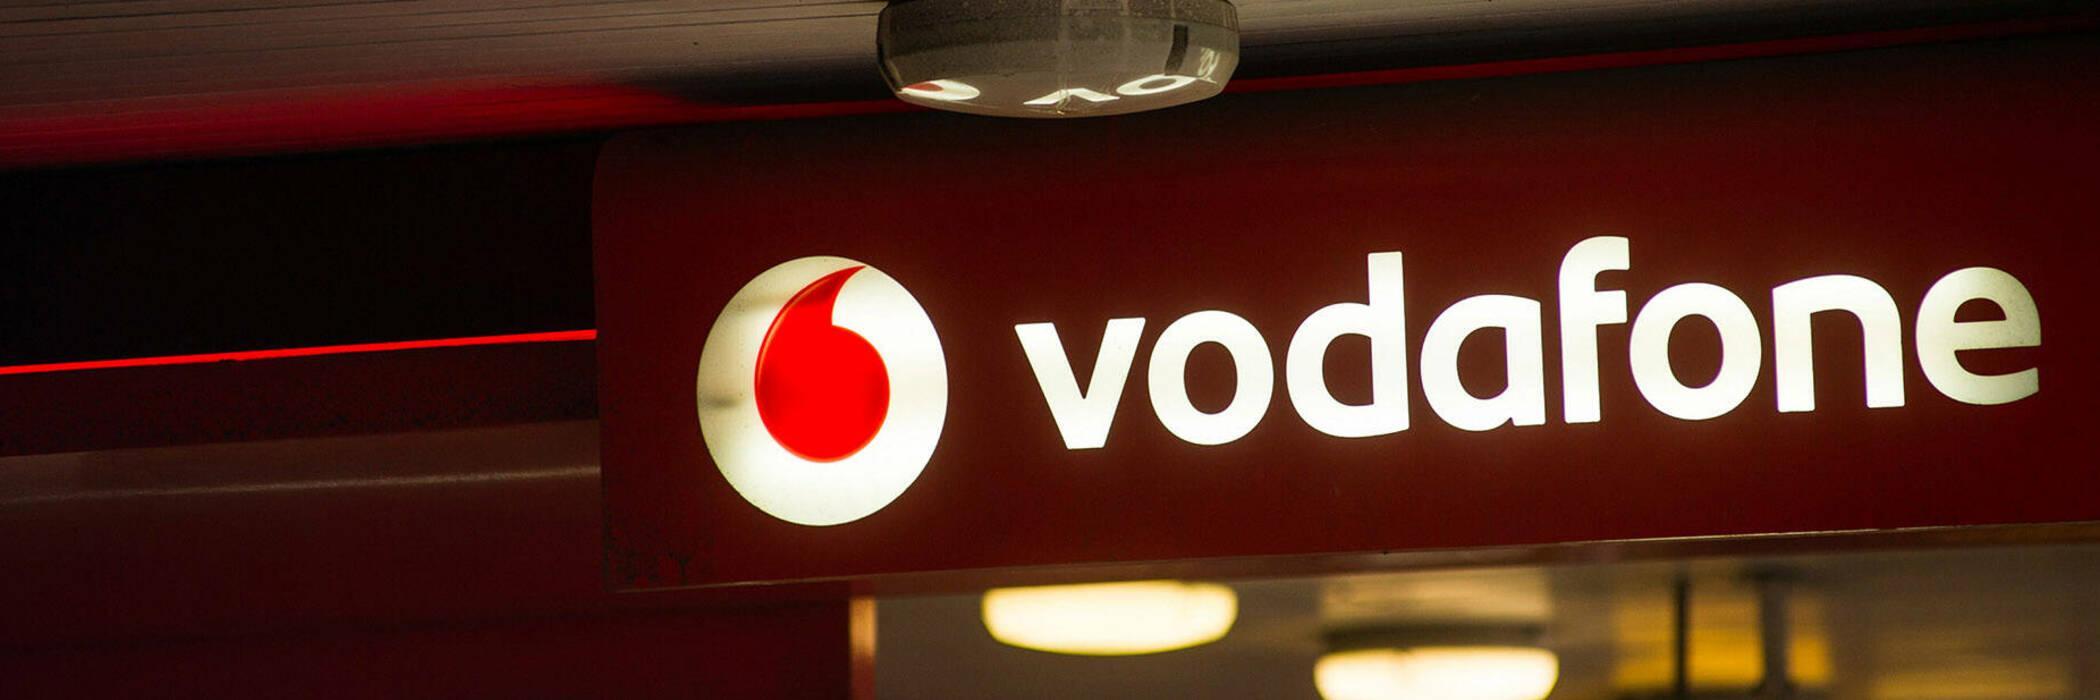 Vodafone shop sign.